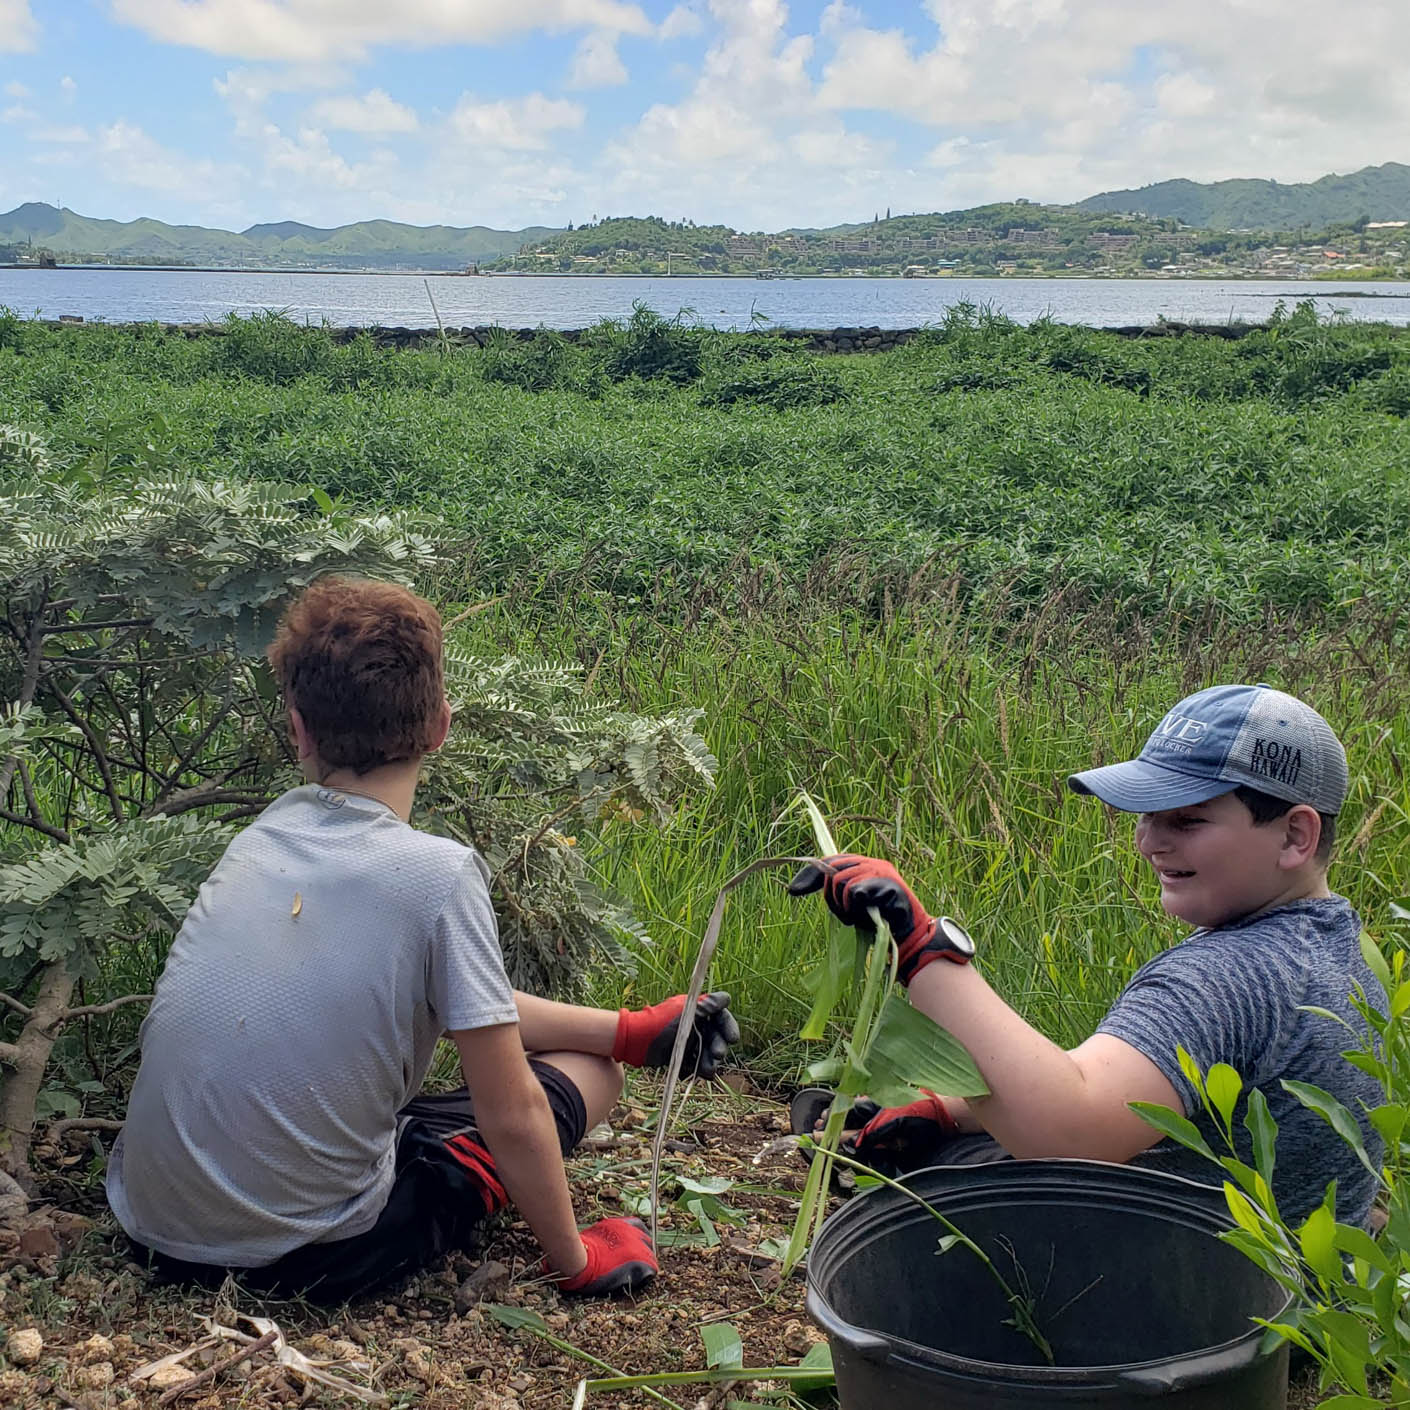 Hawaii Explorer community service